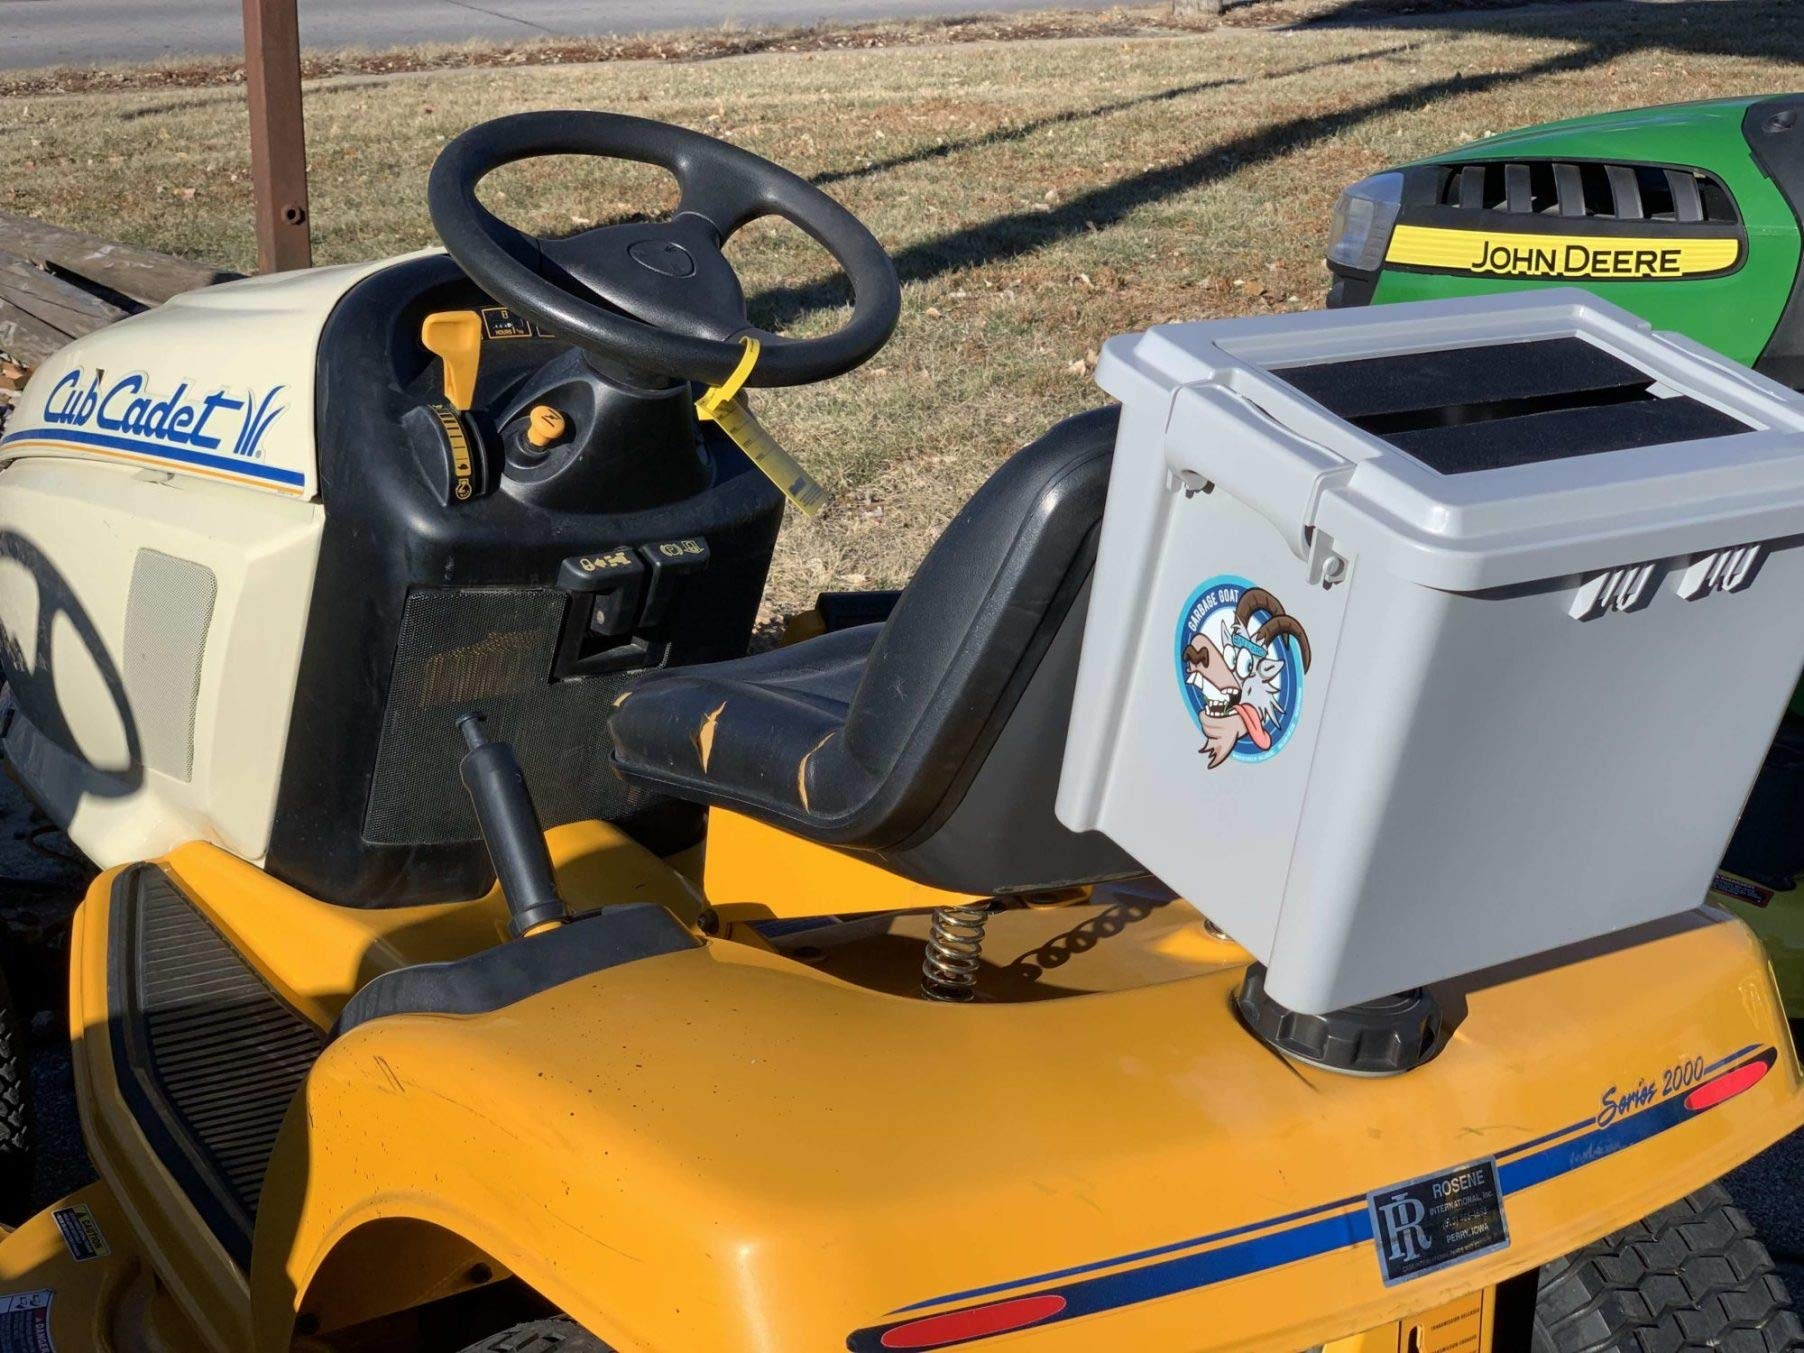 Ballard Inc Garbage Goat - Mower Trash Containment System by Ballard Inc